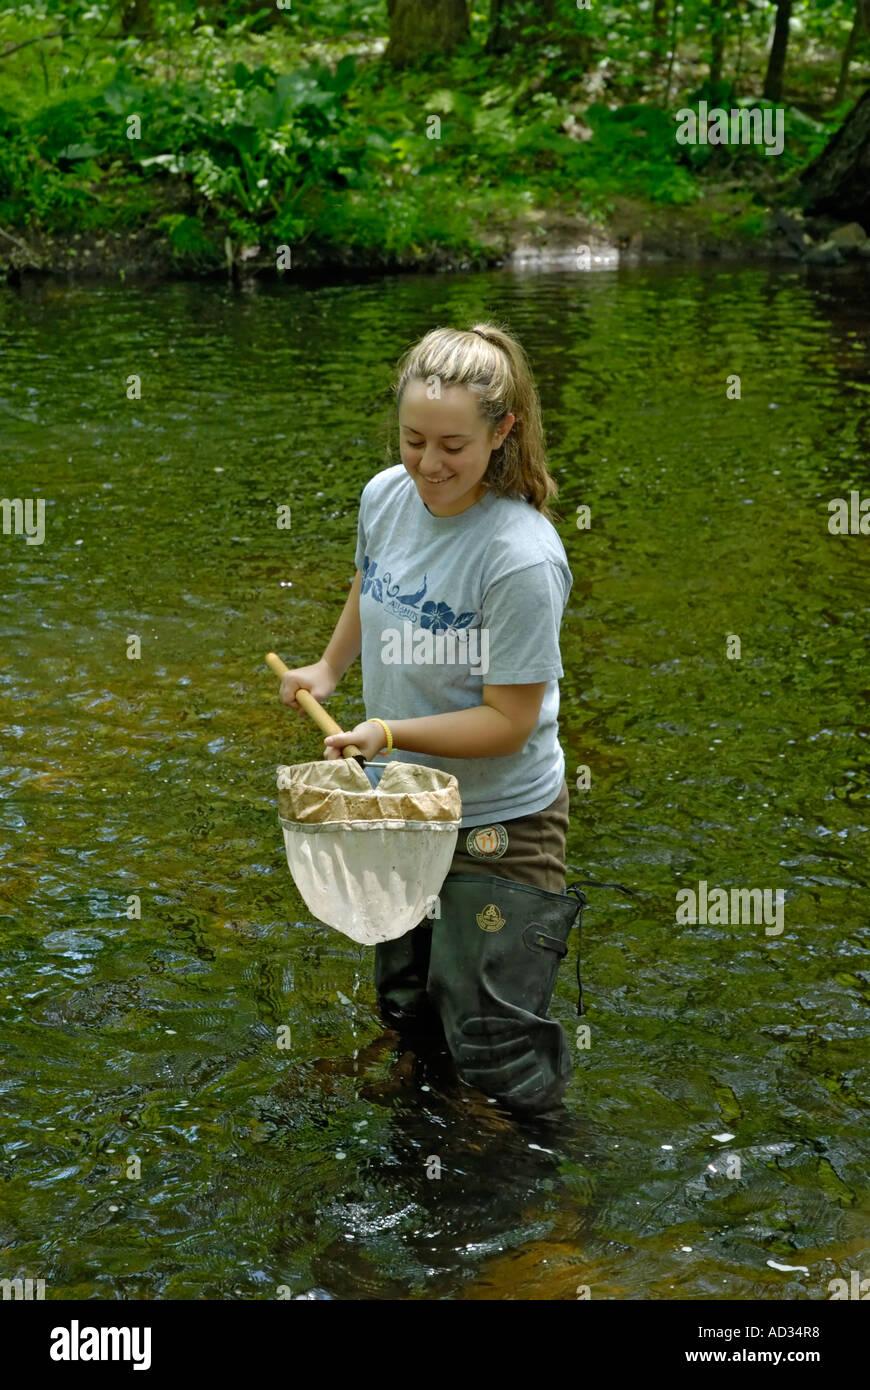 Teenage girl using net sampling river water for fish and invertebrate biological indicators of water quality Stock Photo